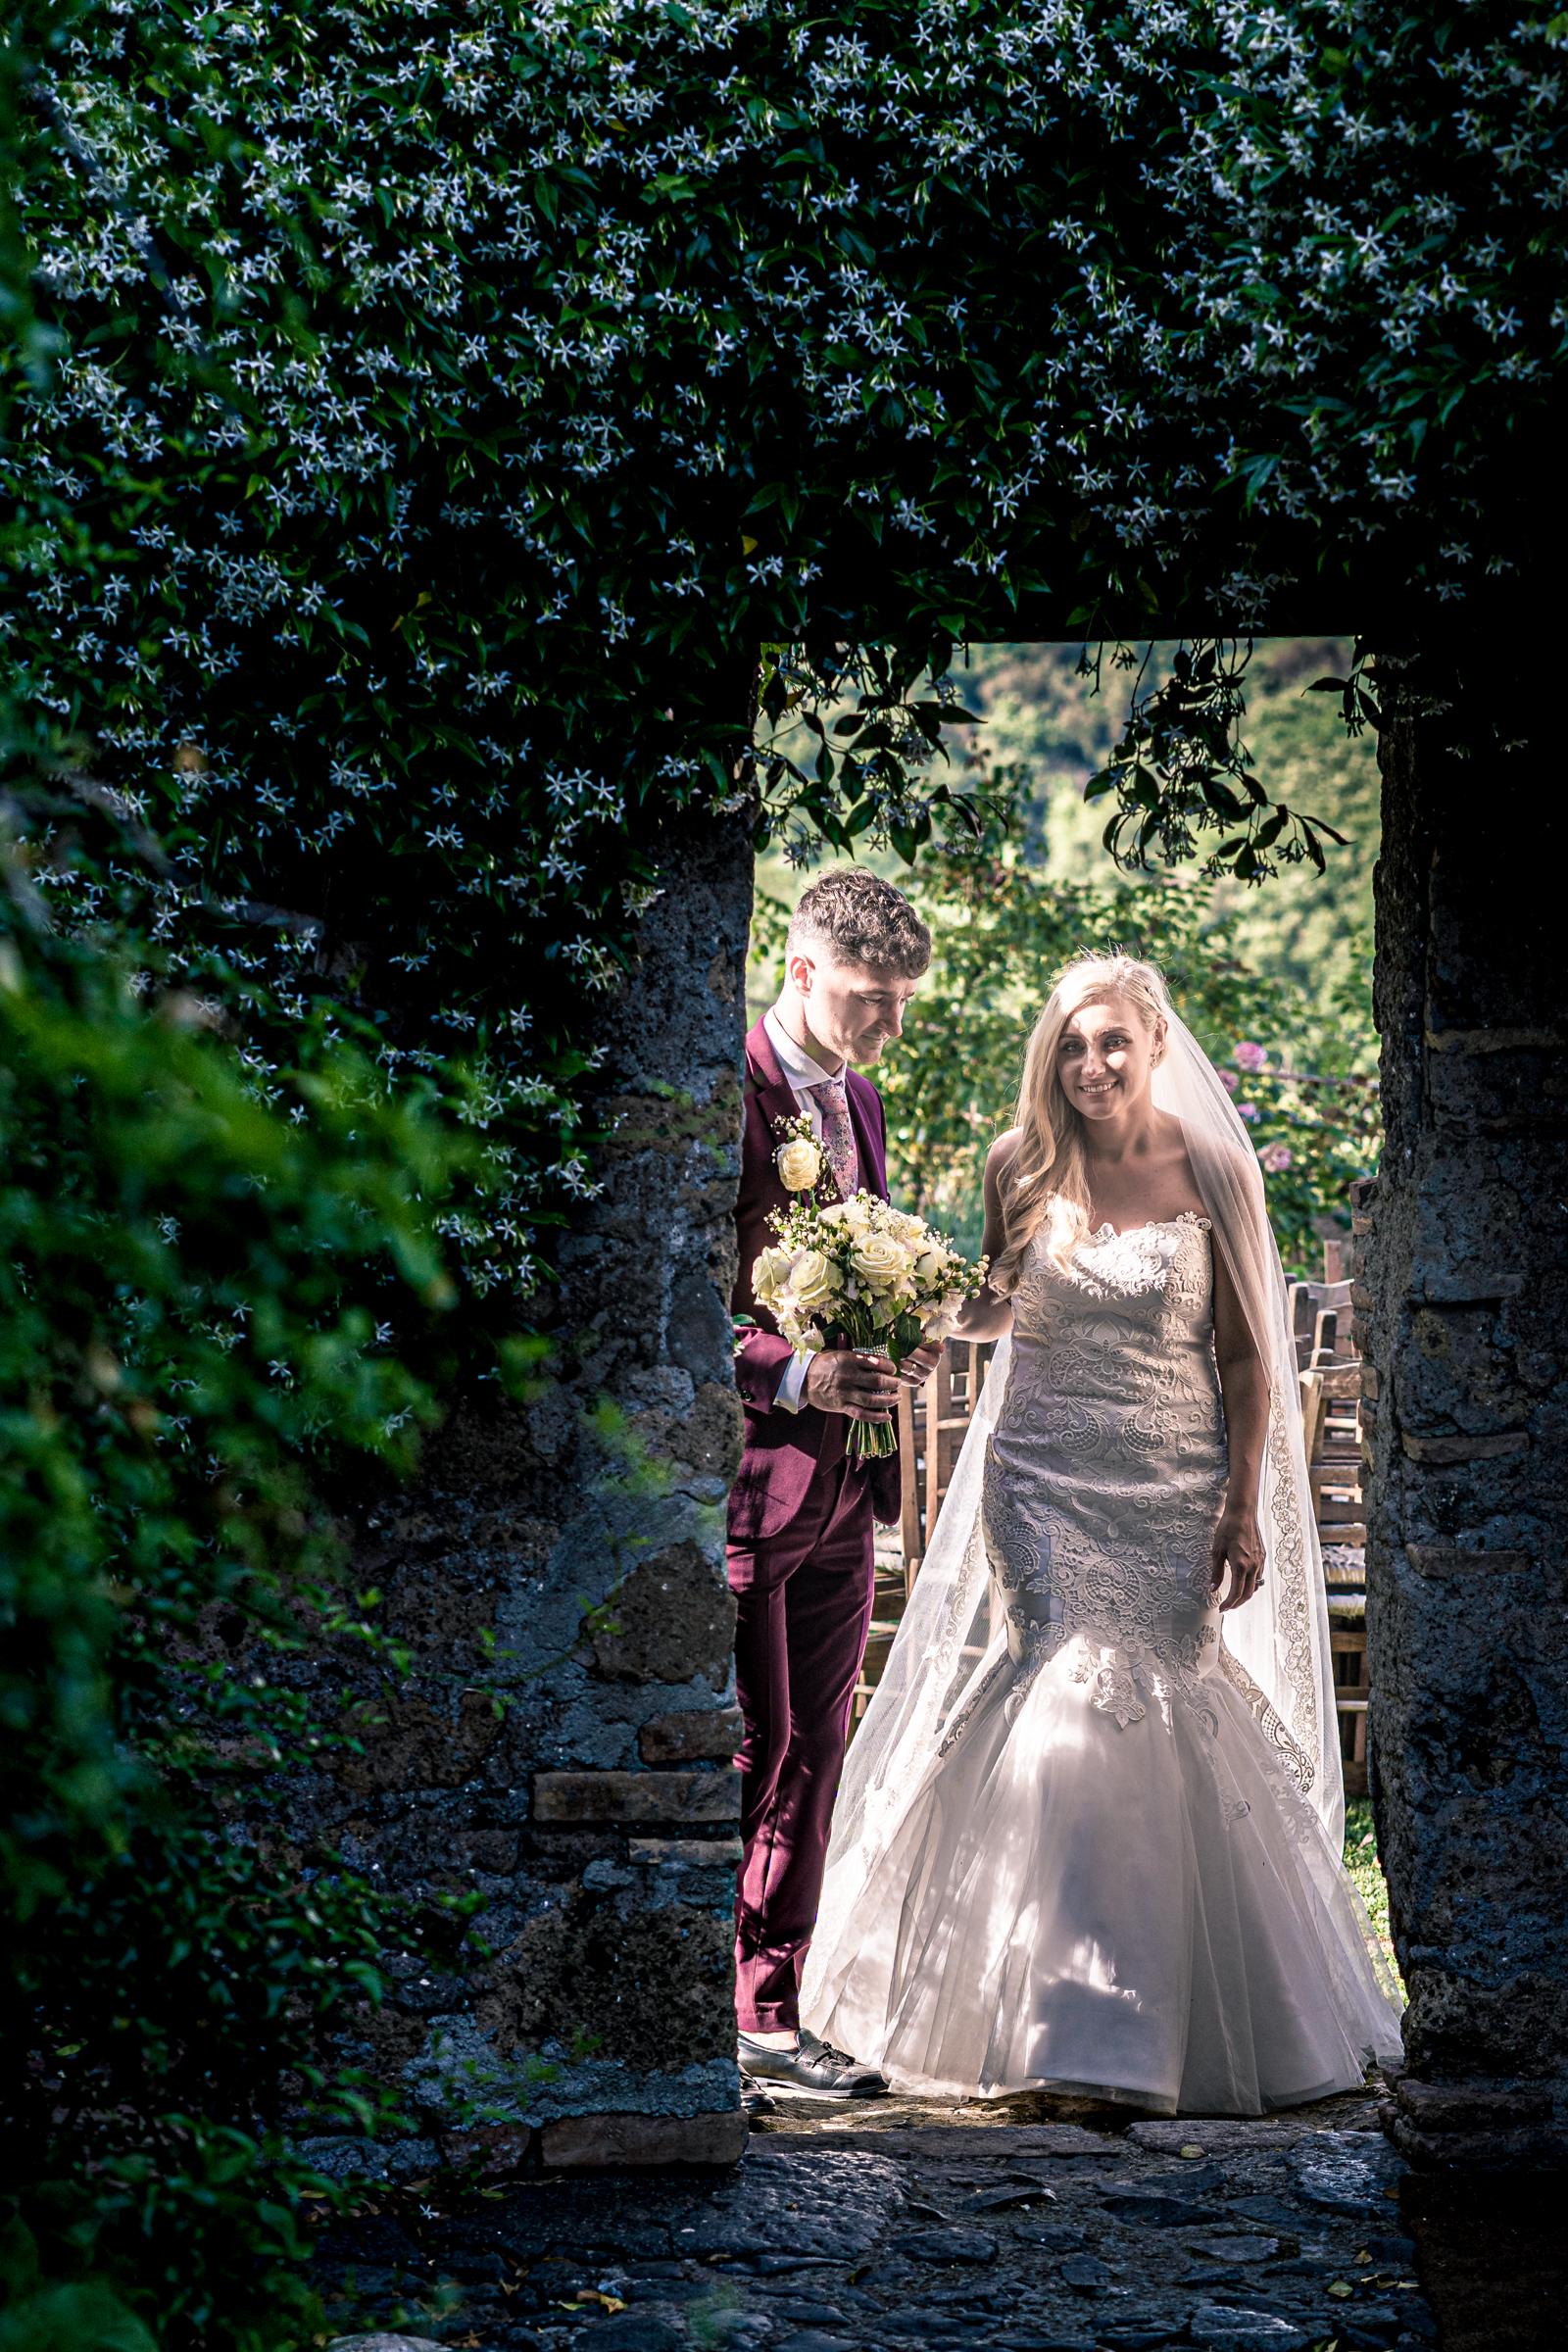 Borgo di tragliata Wedding-30.jpg